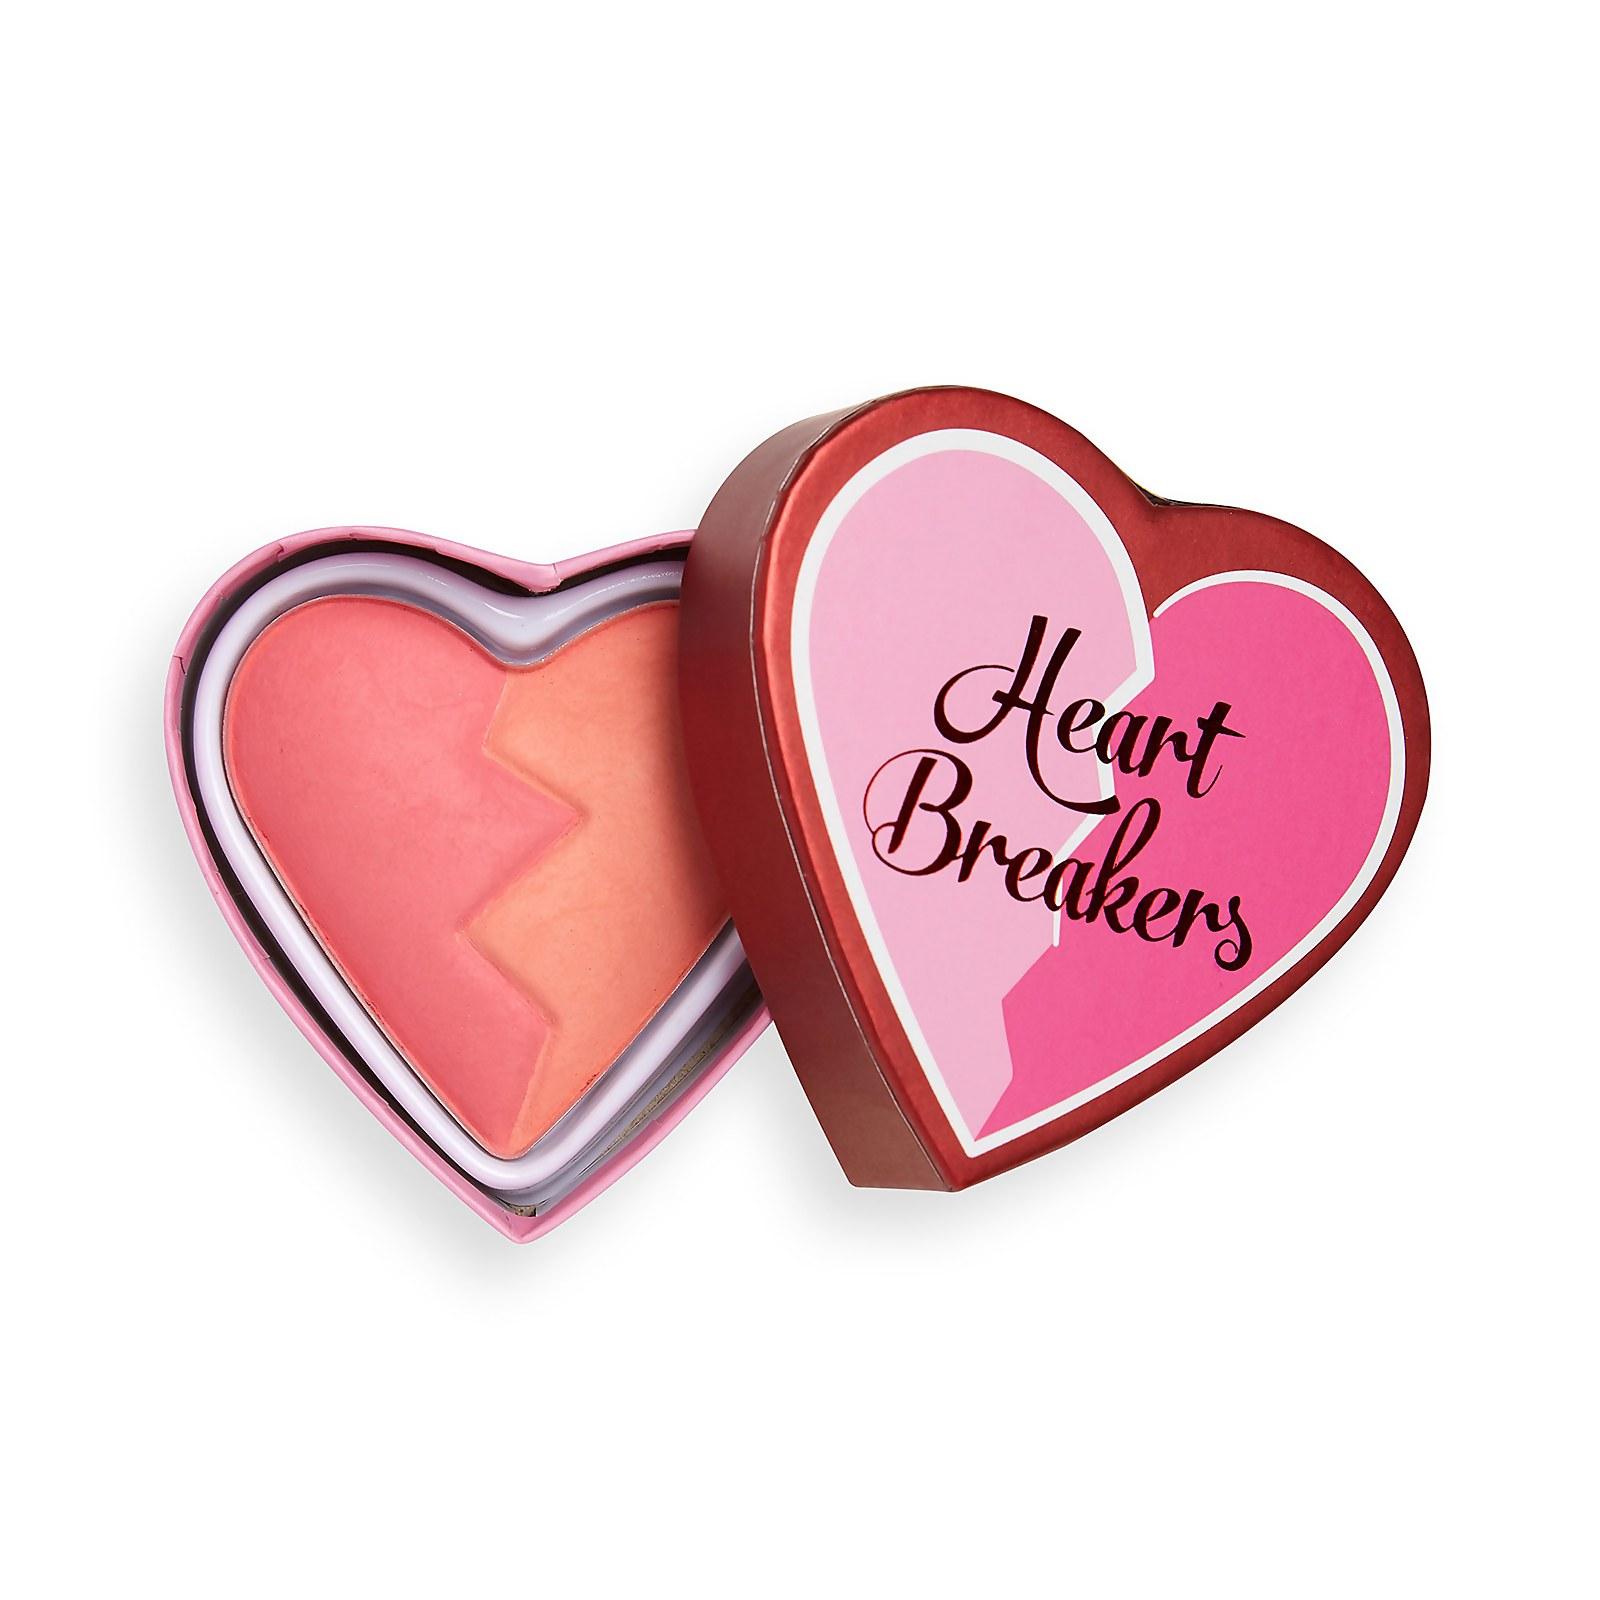 Купить Матовые румяна Revolution I Heart Revolution Heartbreakers - Inspiring